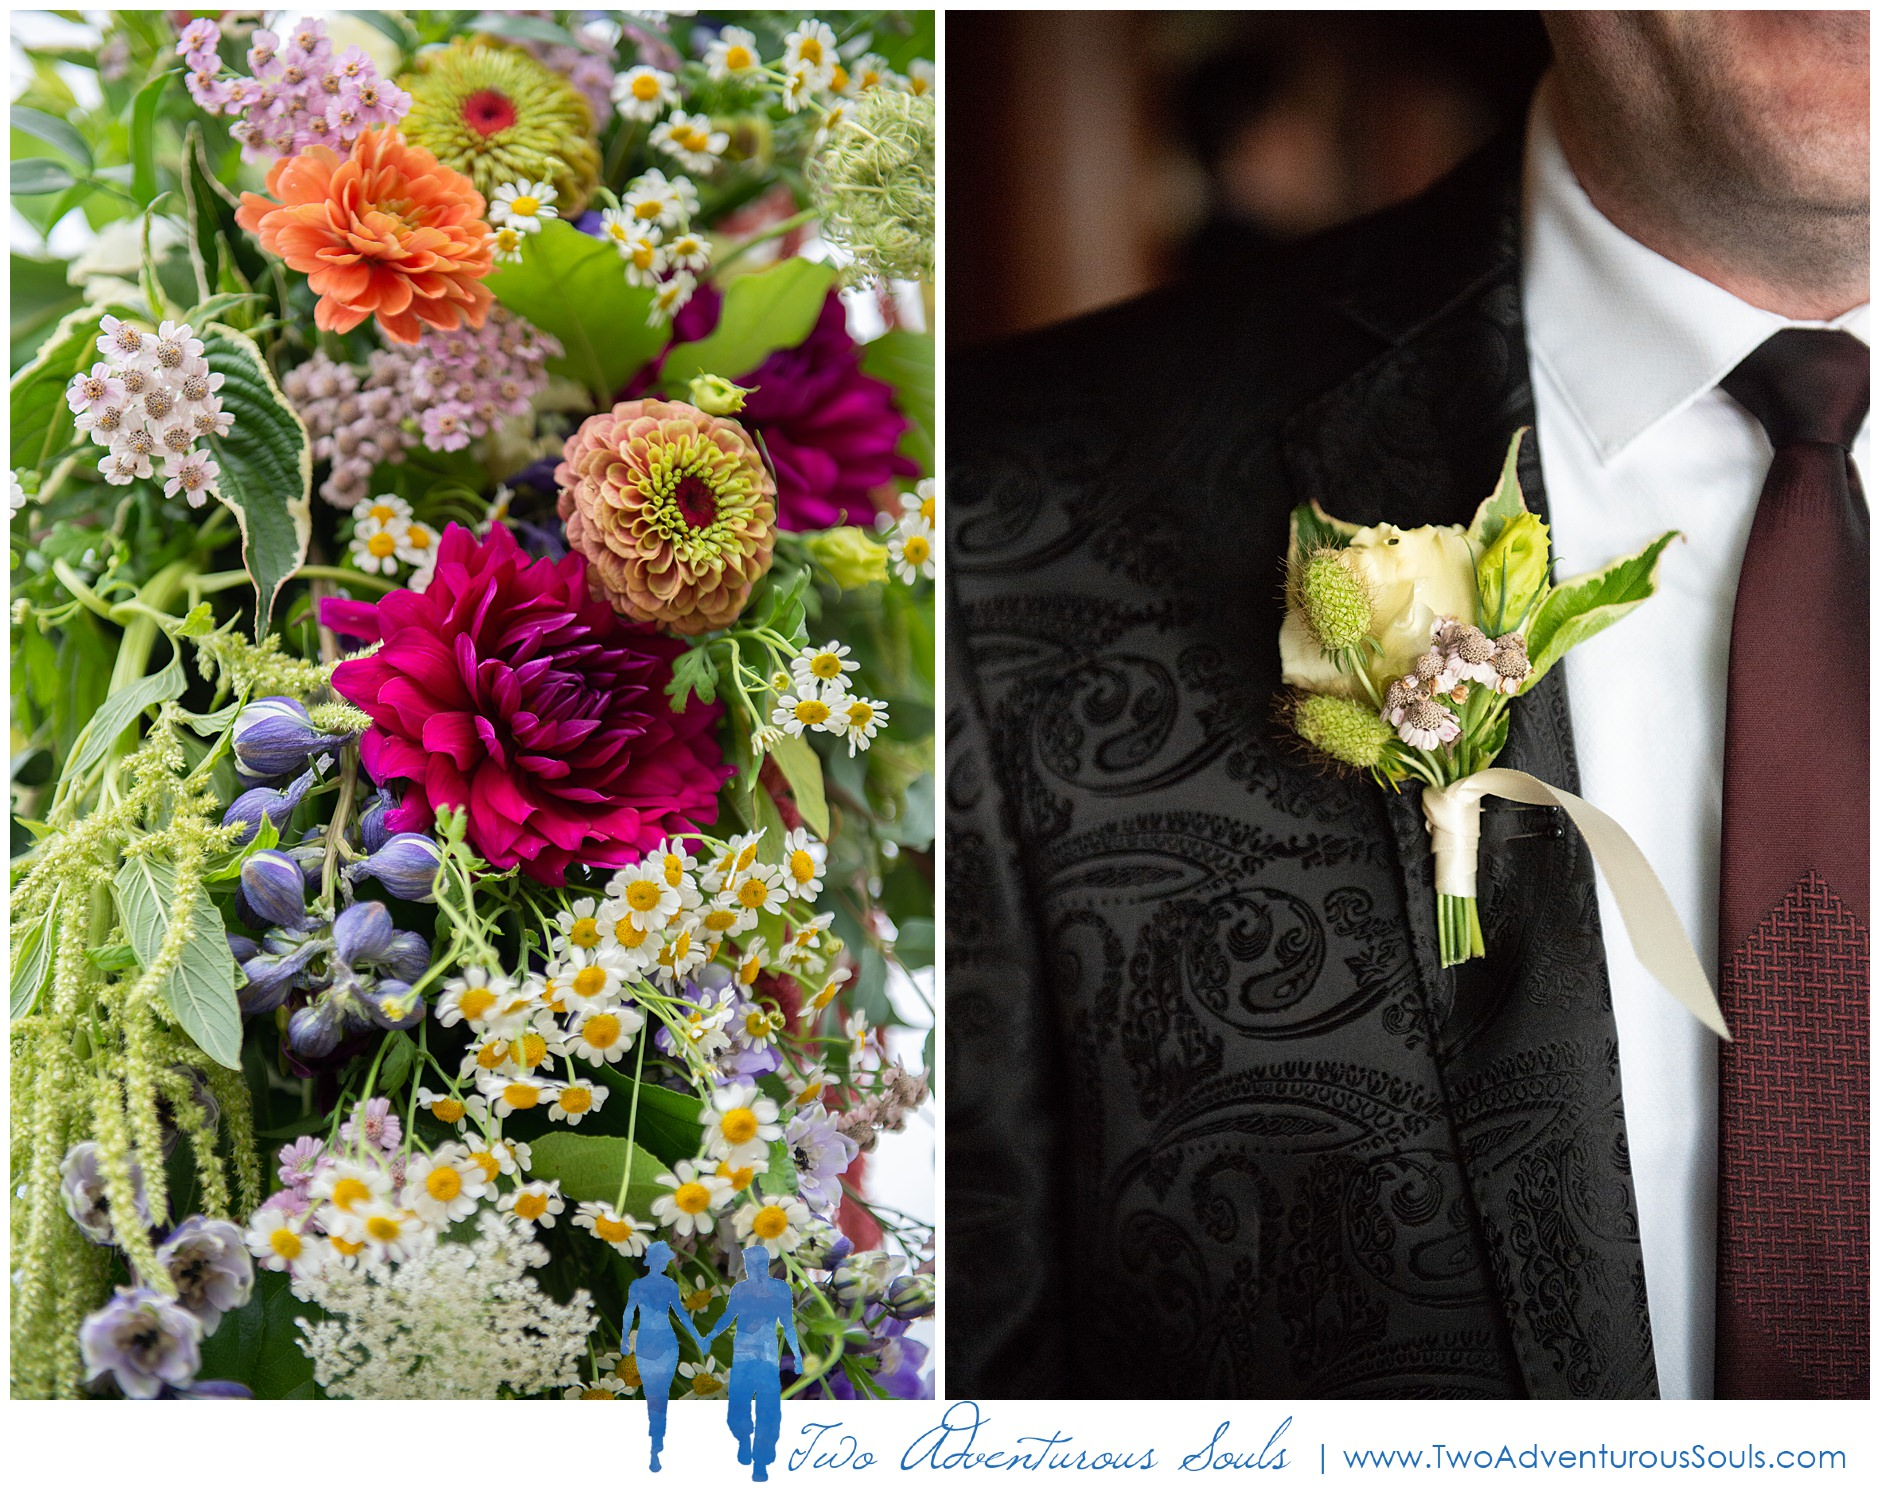 Chebeague Island Inn Wedding Photograpehrs, Maine Wedding Photographers, Two Adventurous Souls-082419_0005.jpg